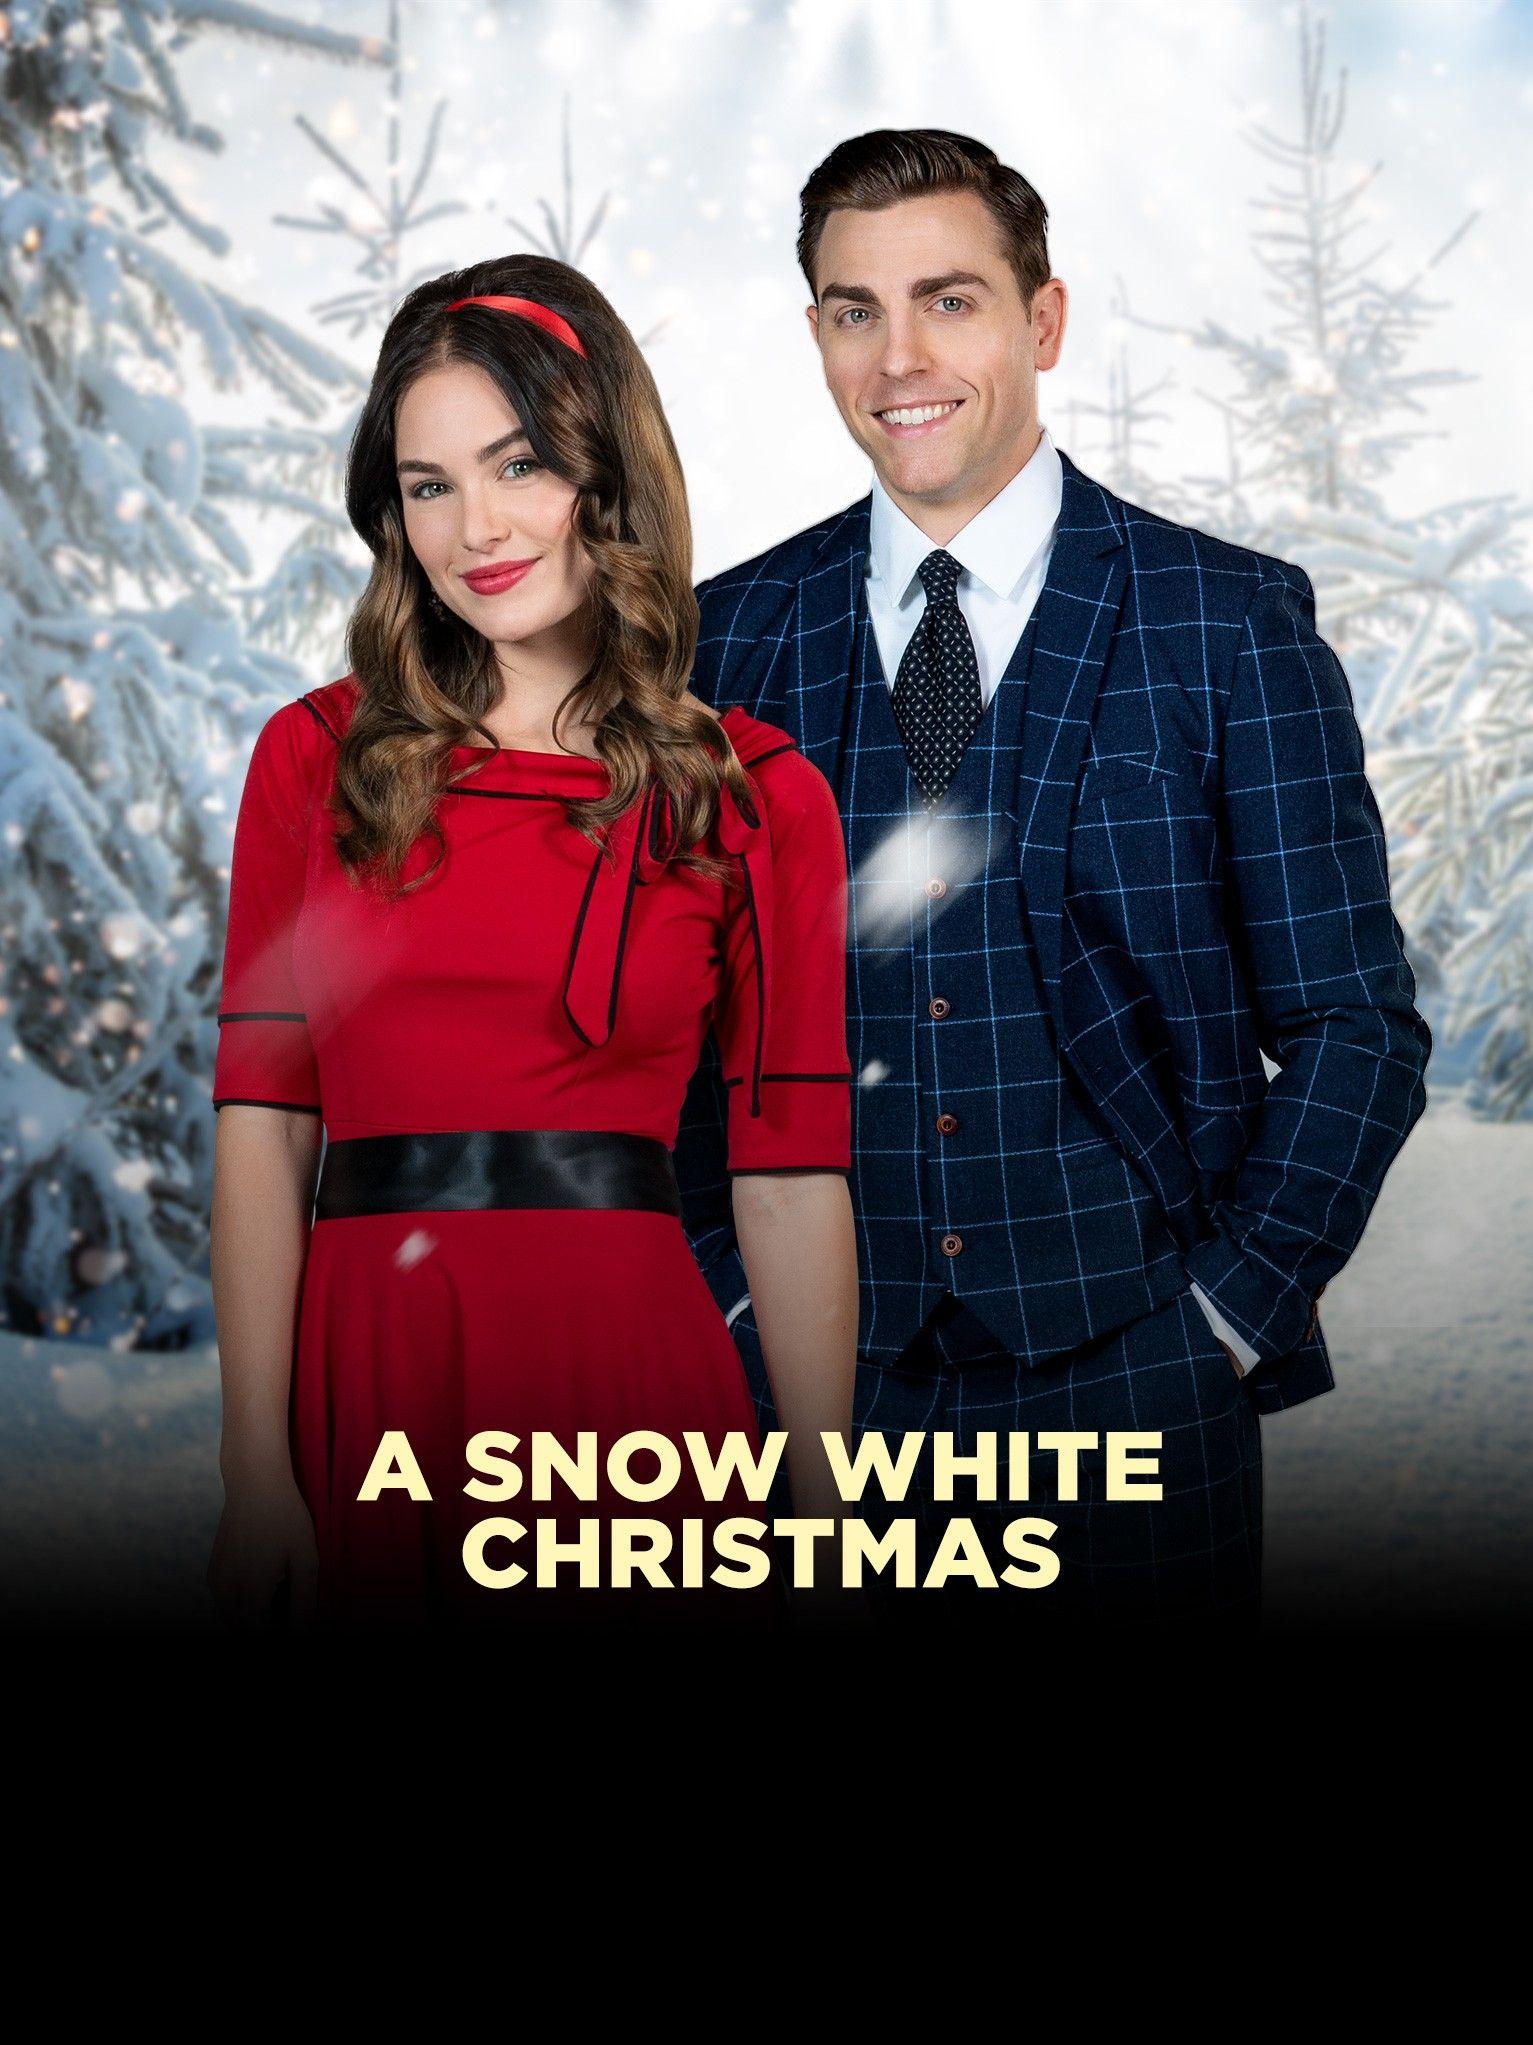 A Snow White Christmas 2020 Ion A Snow White Christmas 2018 starring Michelle Randolph Dec 9 ion